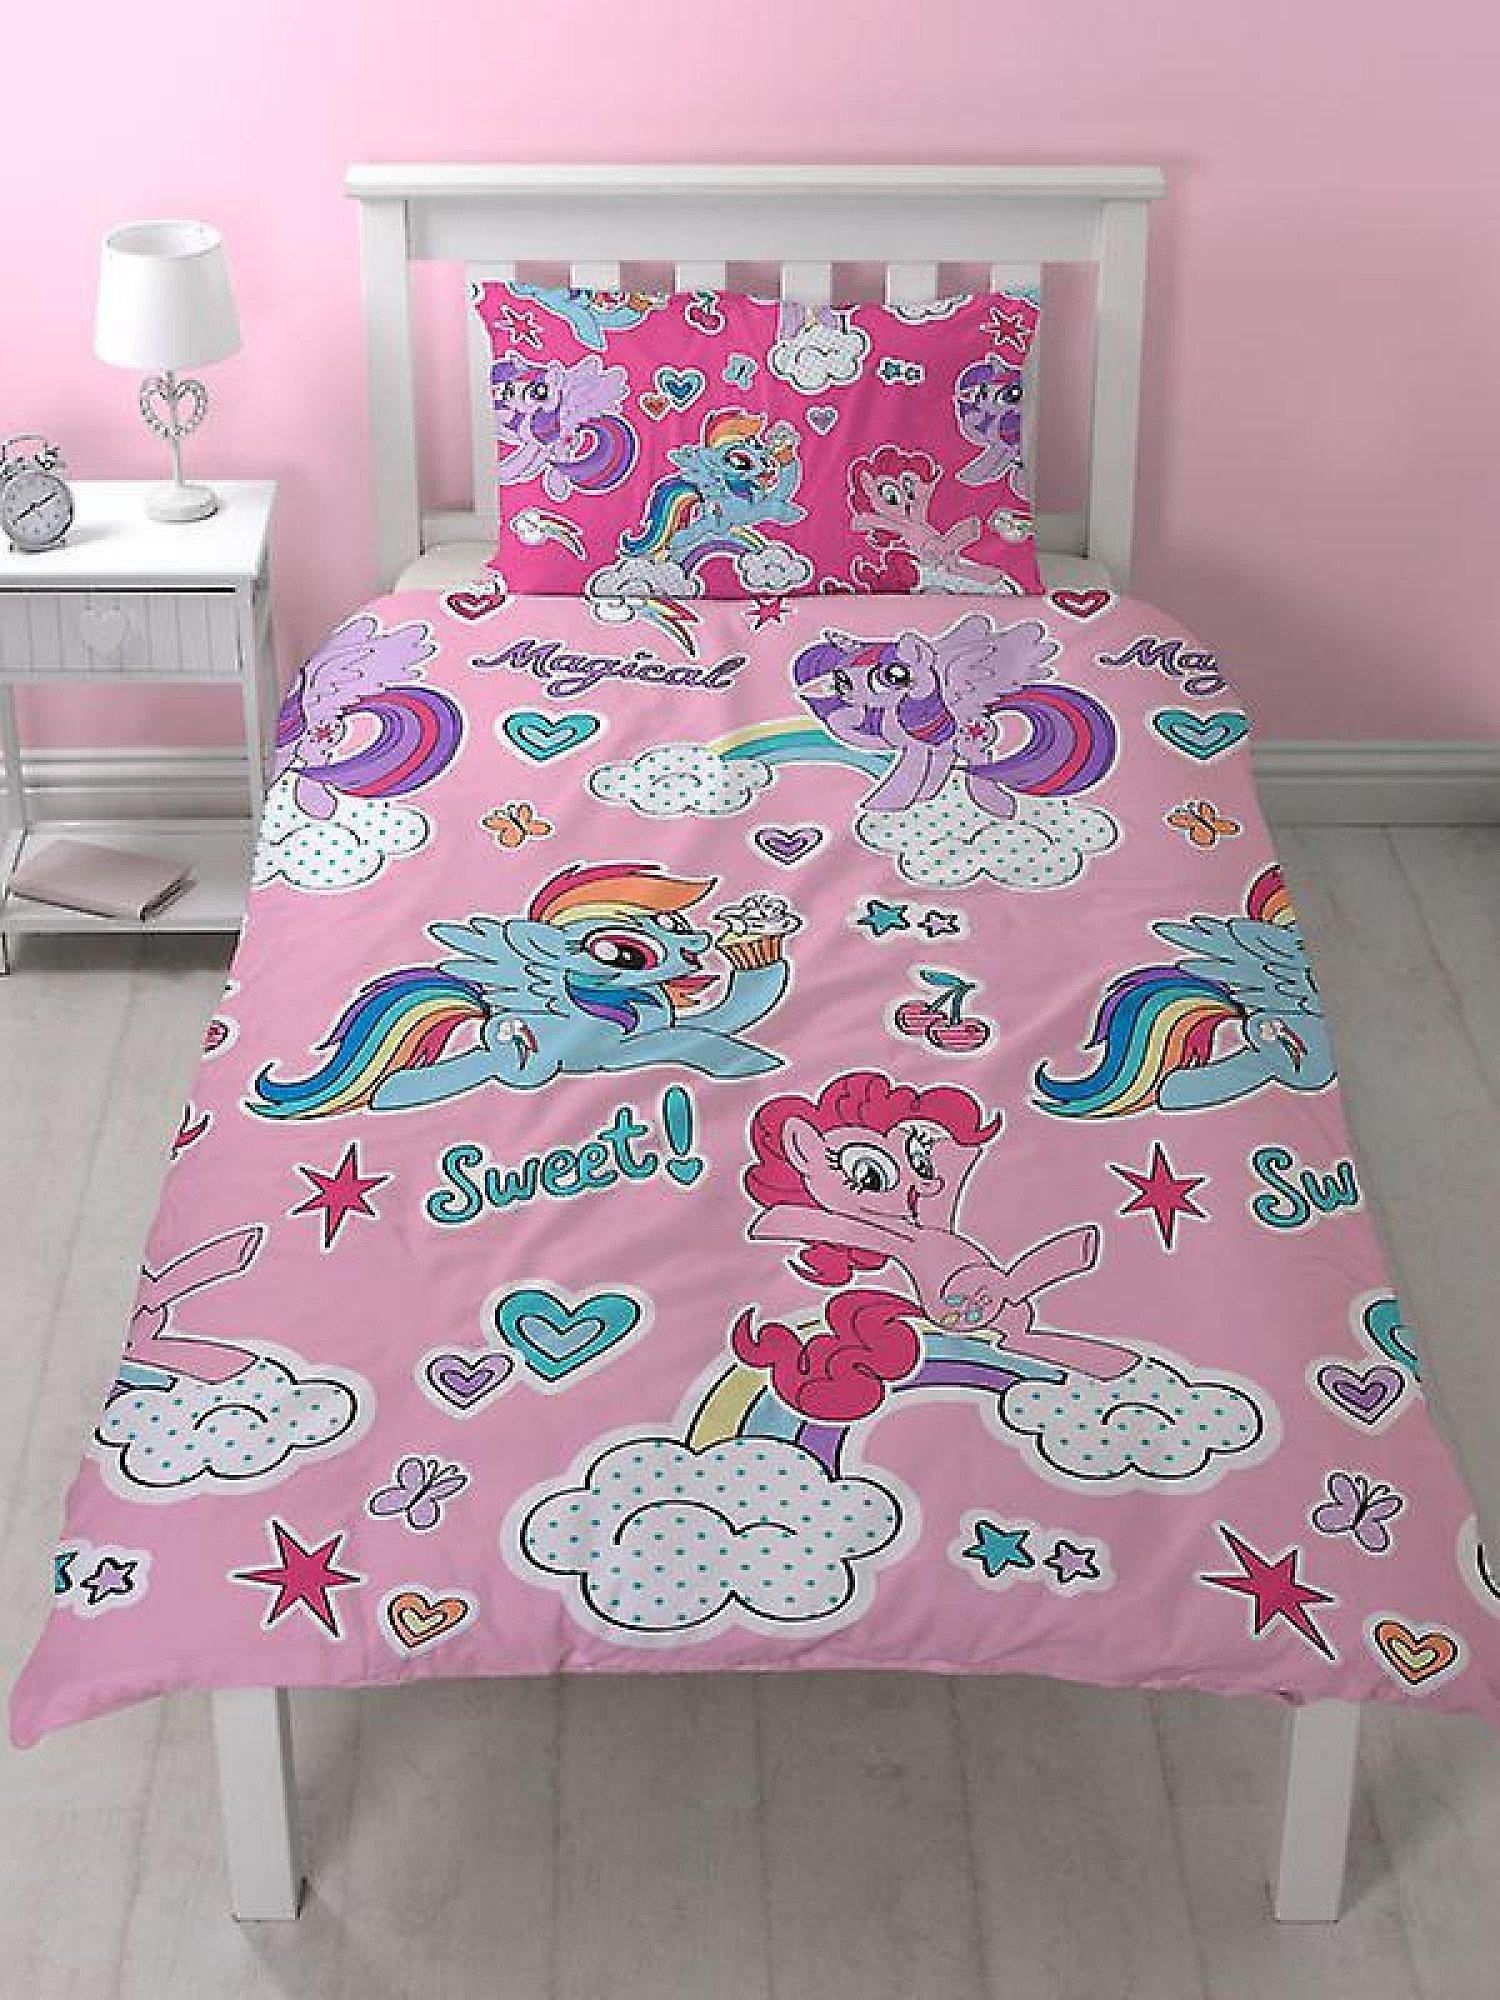 My Little Pony Cupcake Duvet Cover & Pillowcase Set - Single